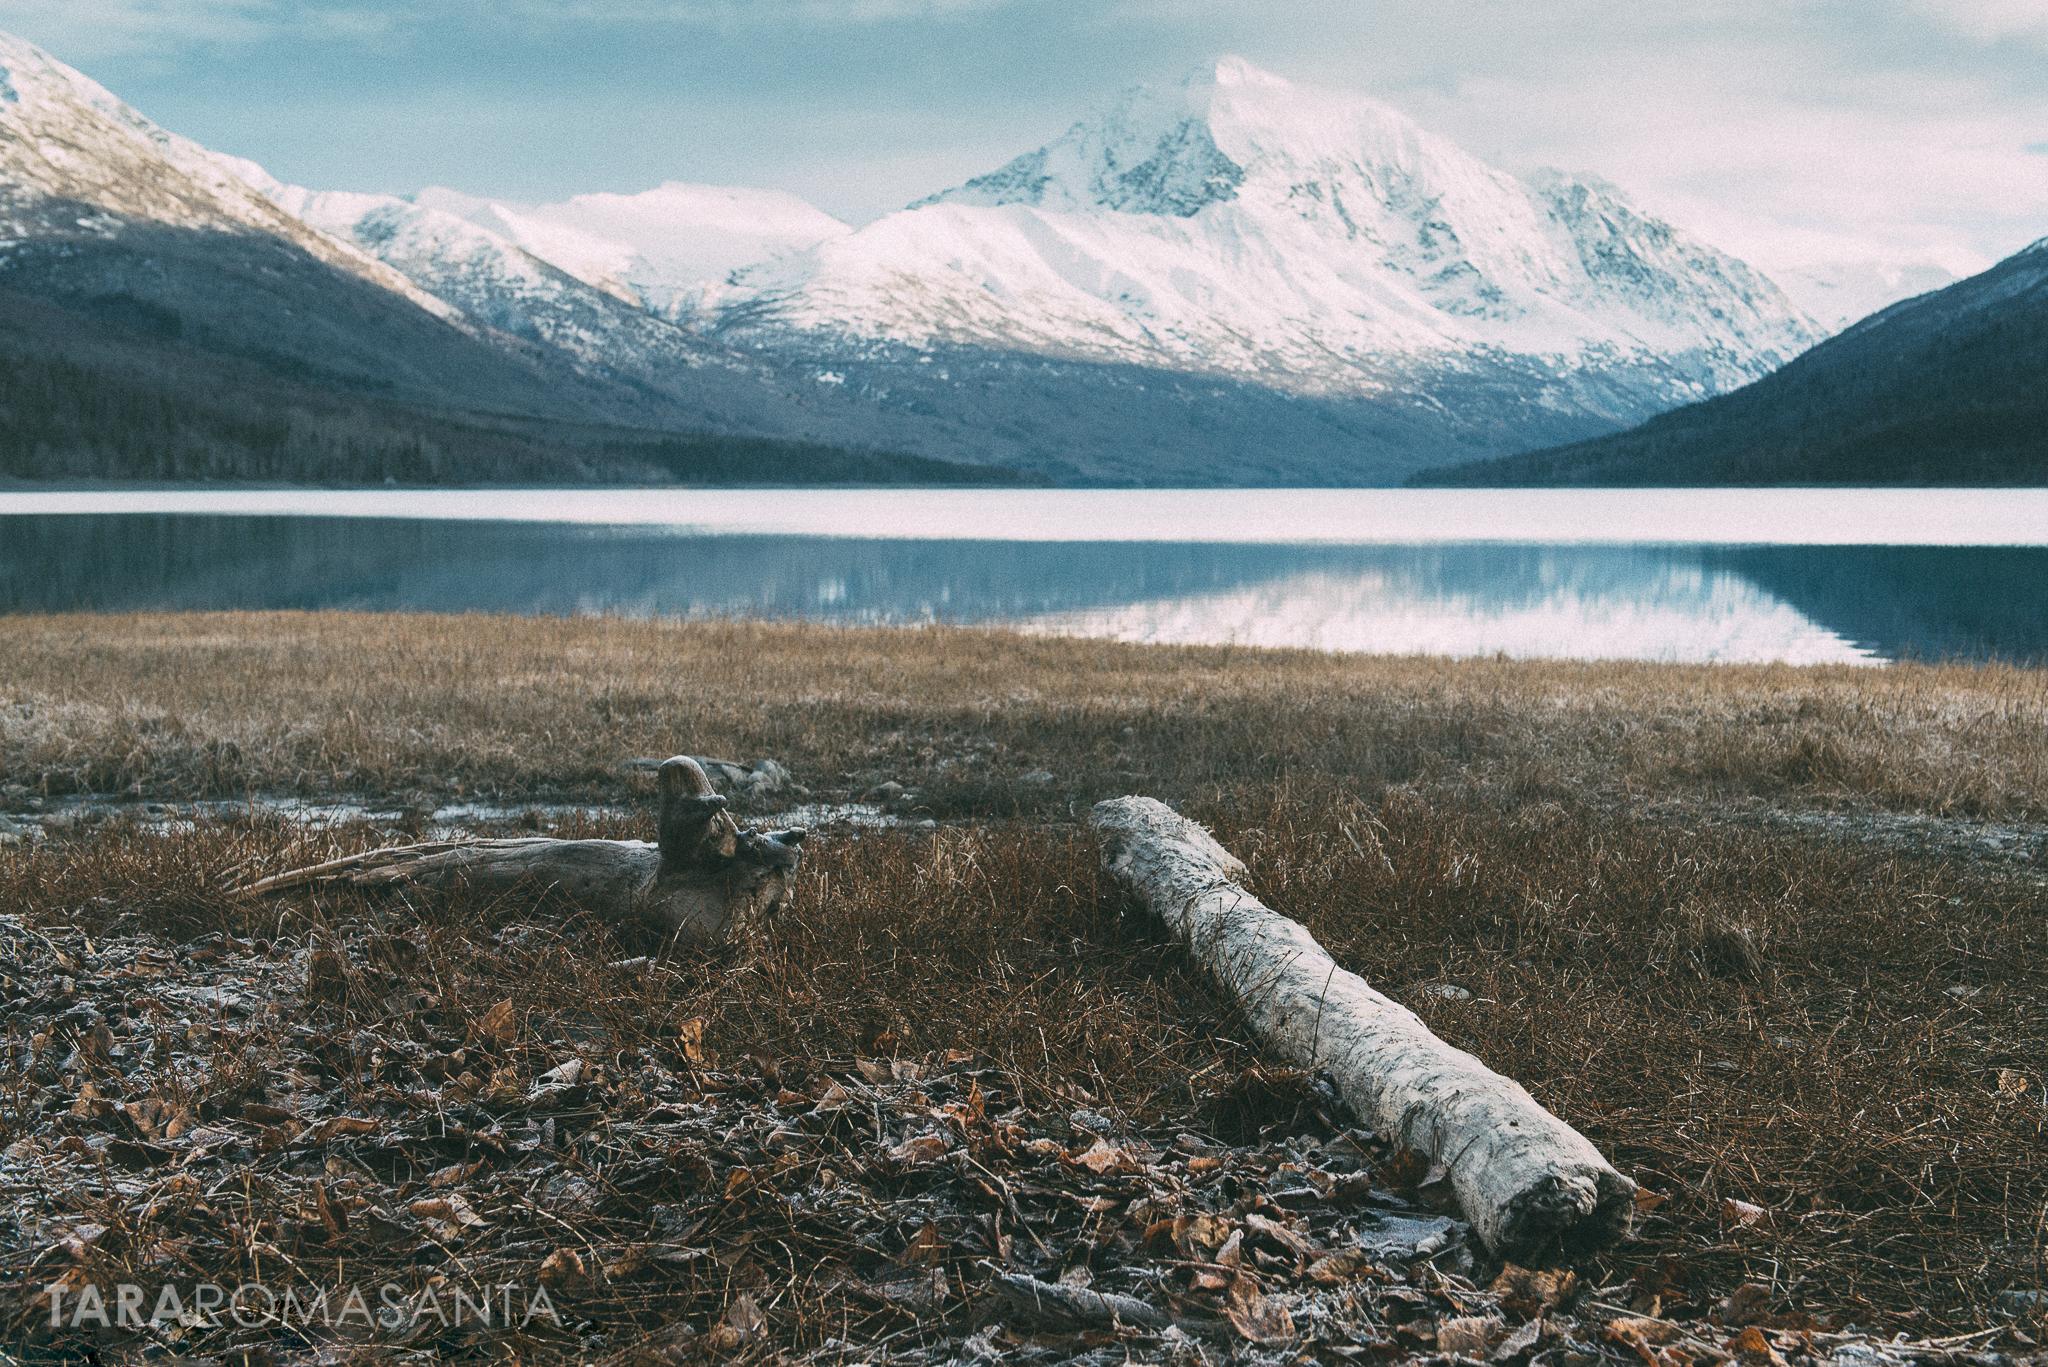 beauty in the breakdown at lake eklutna a landscape image by tara romasanta